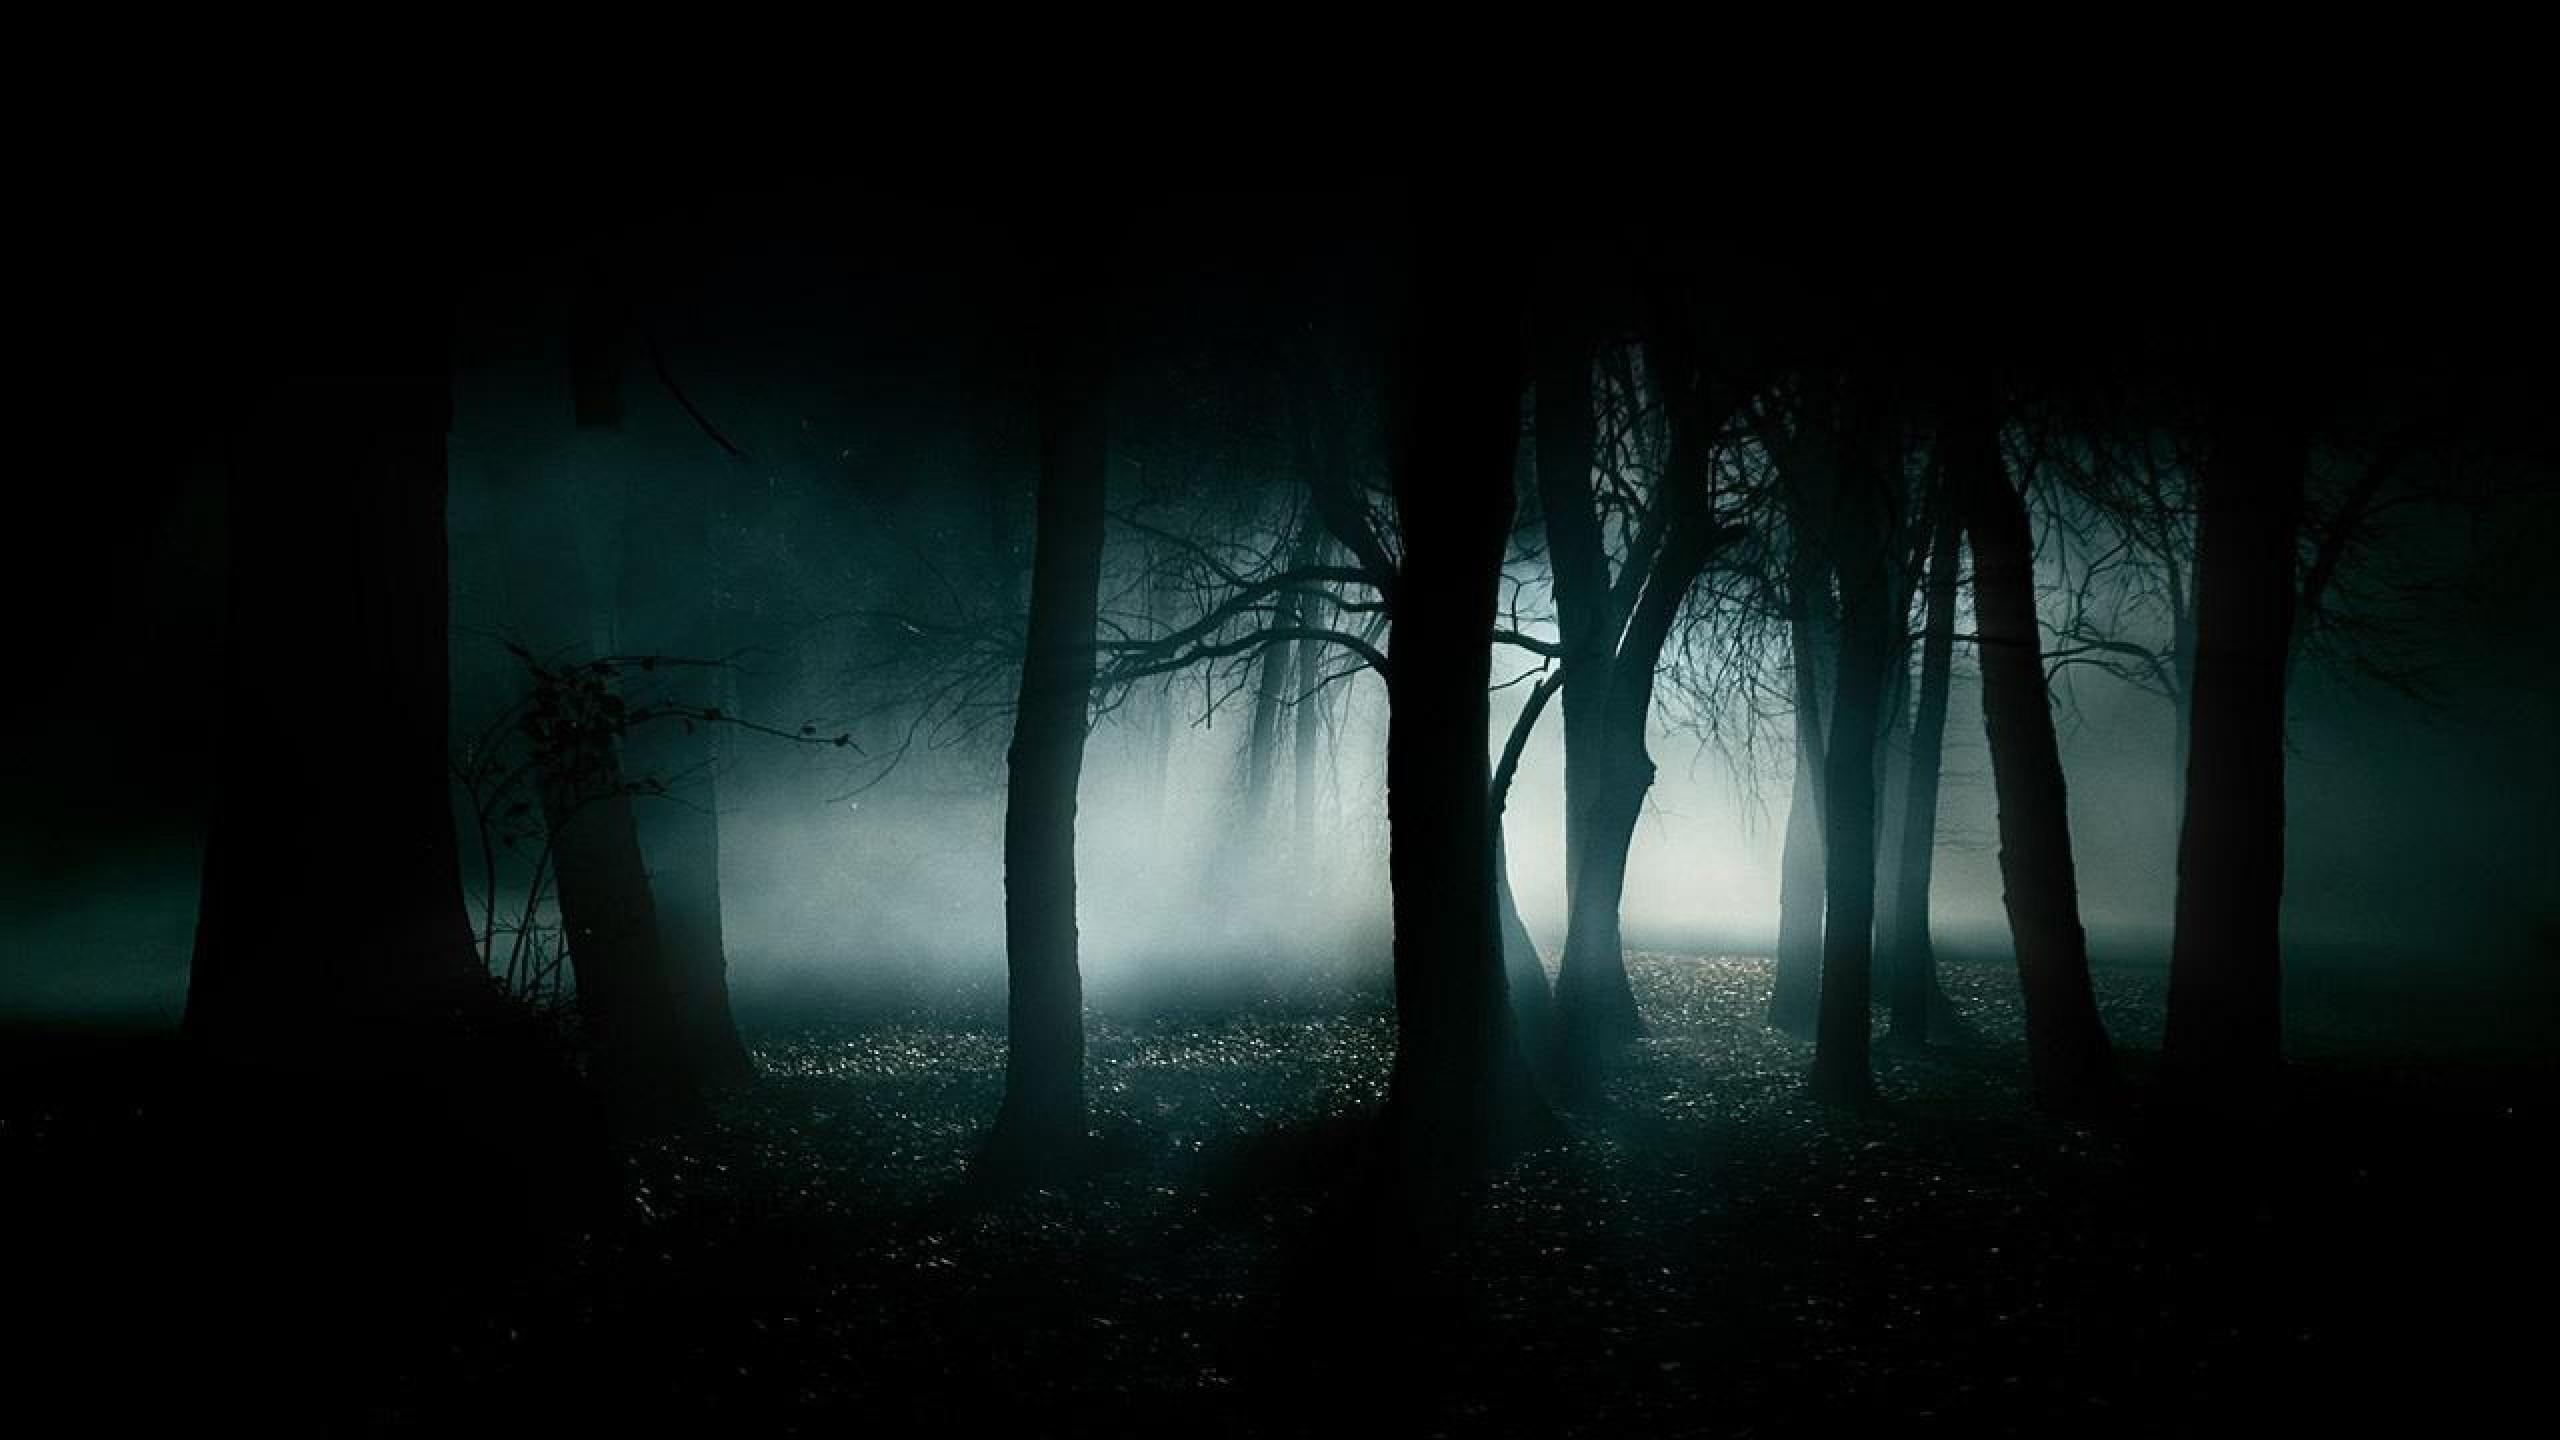 Dark Forest Hd Wallpaper 61 Images